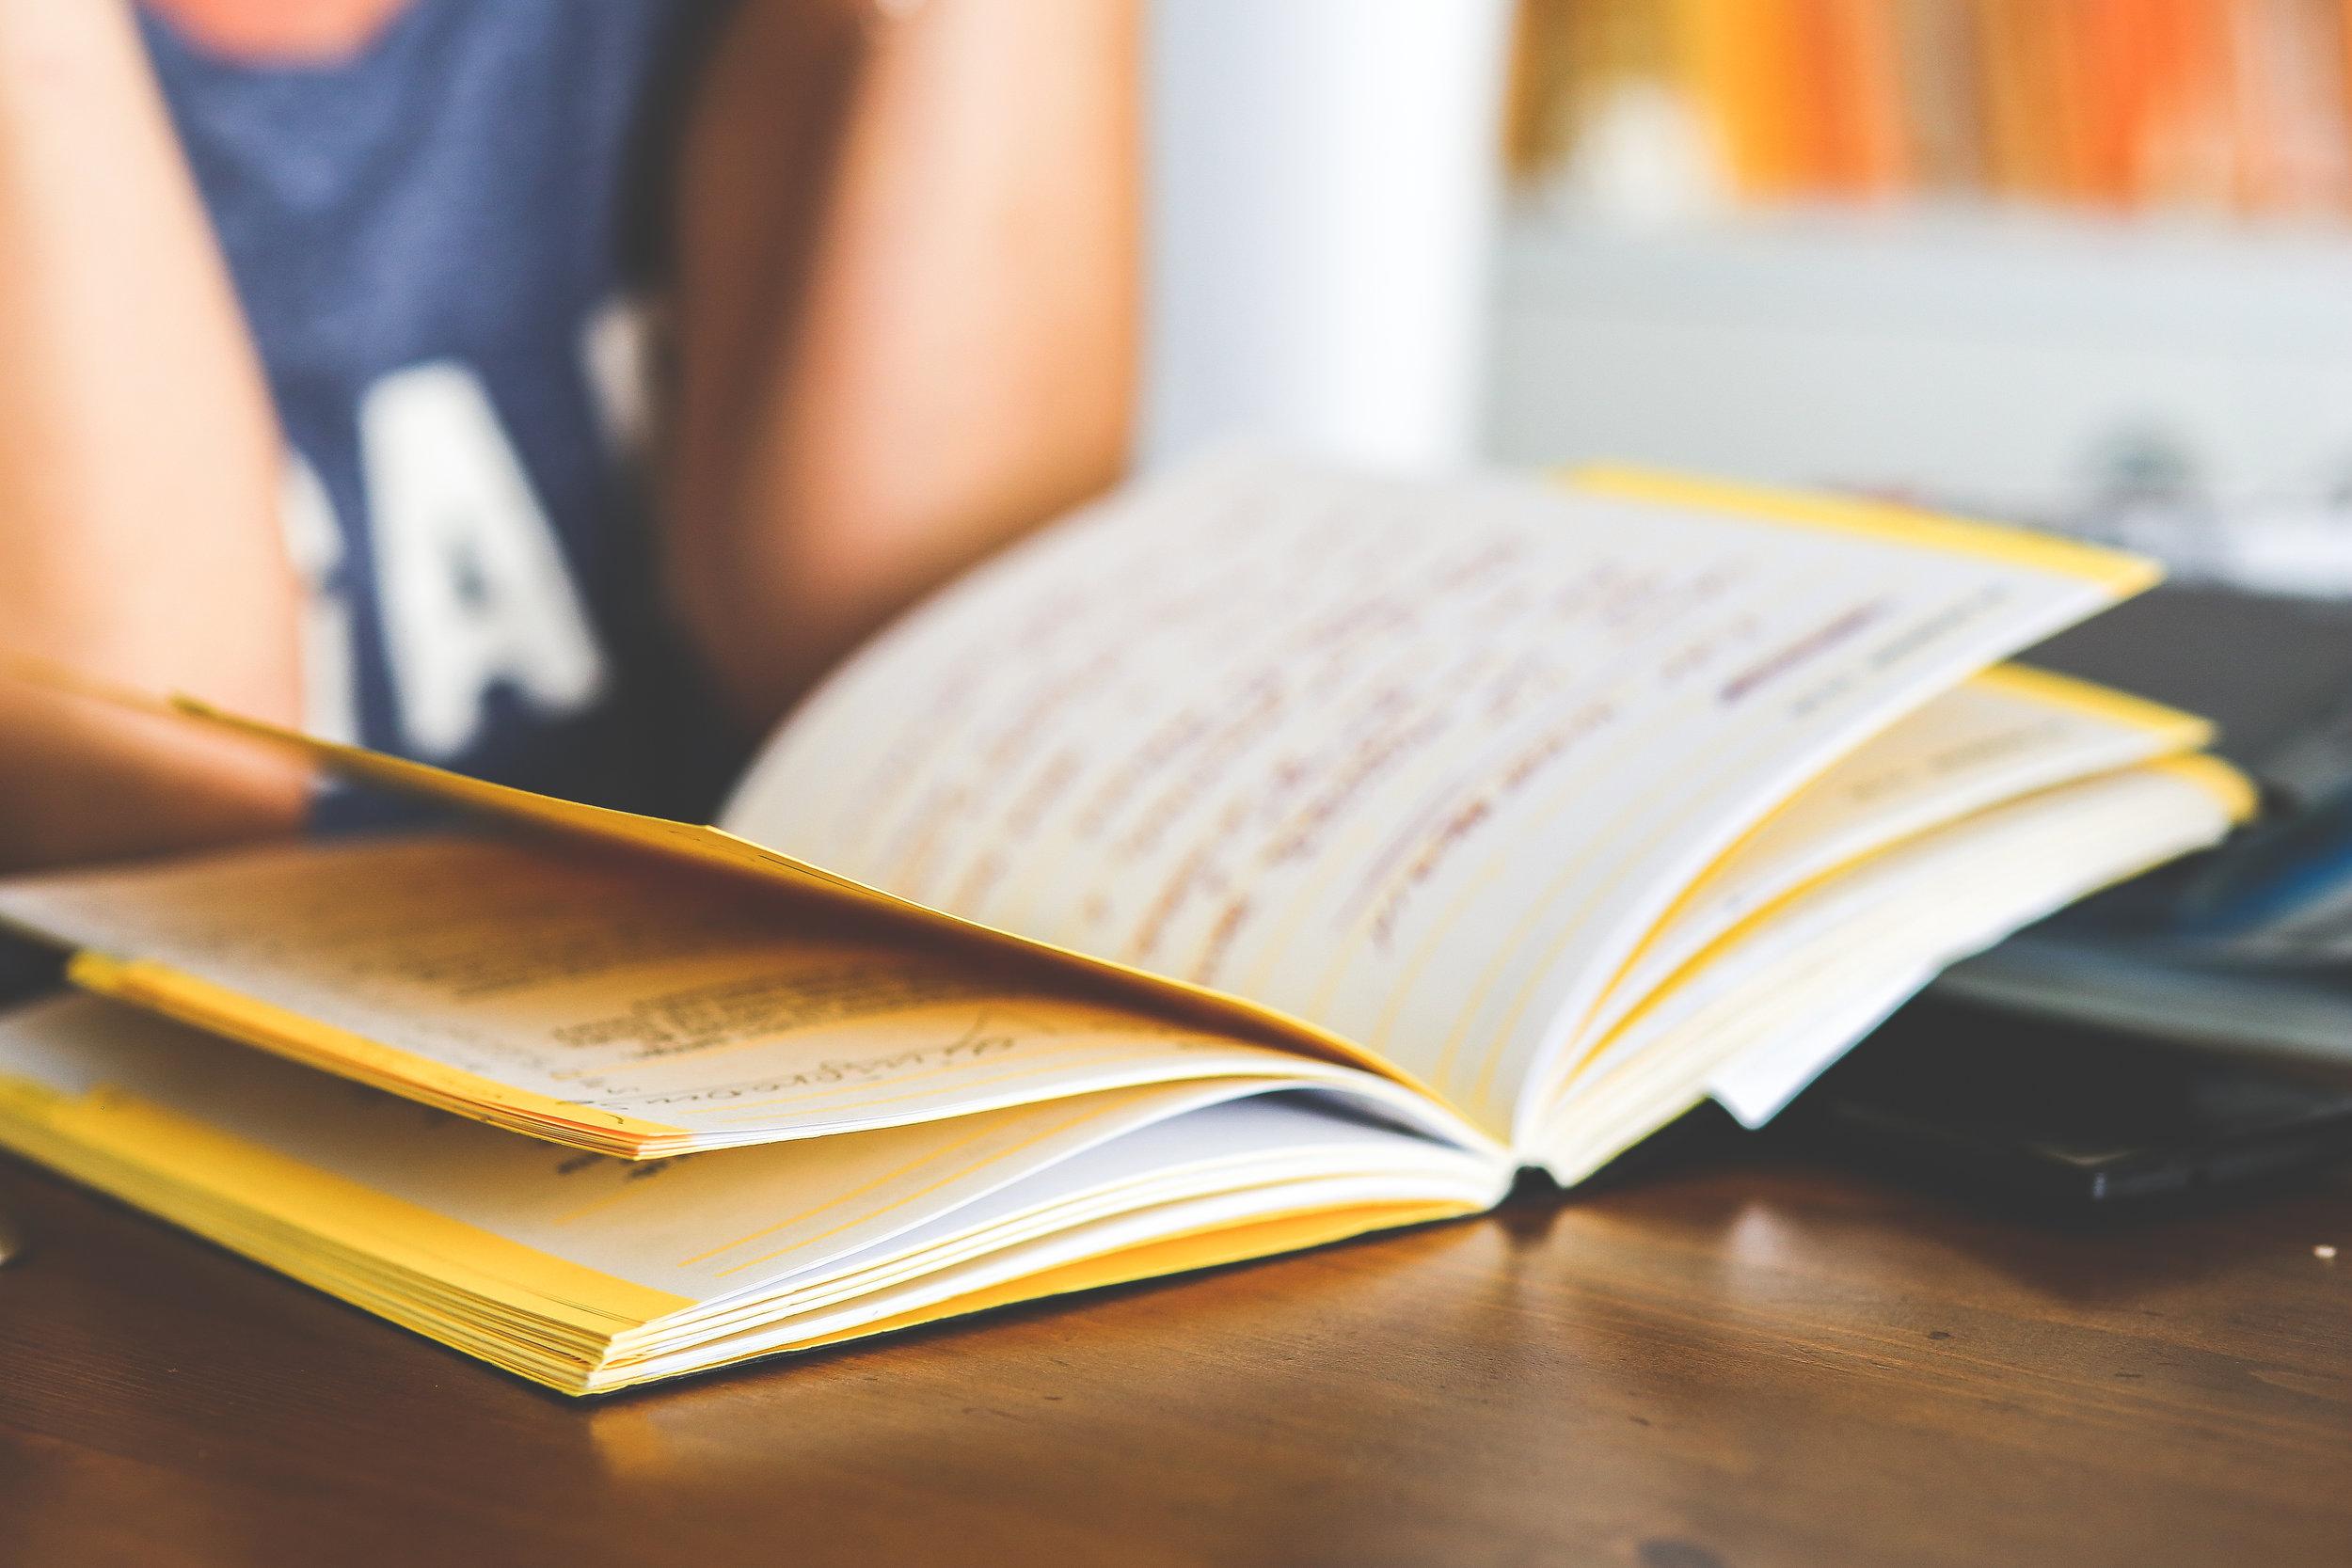 woman-notebook-working-girl.jpg